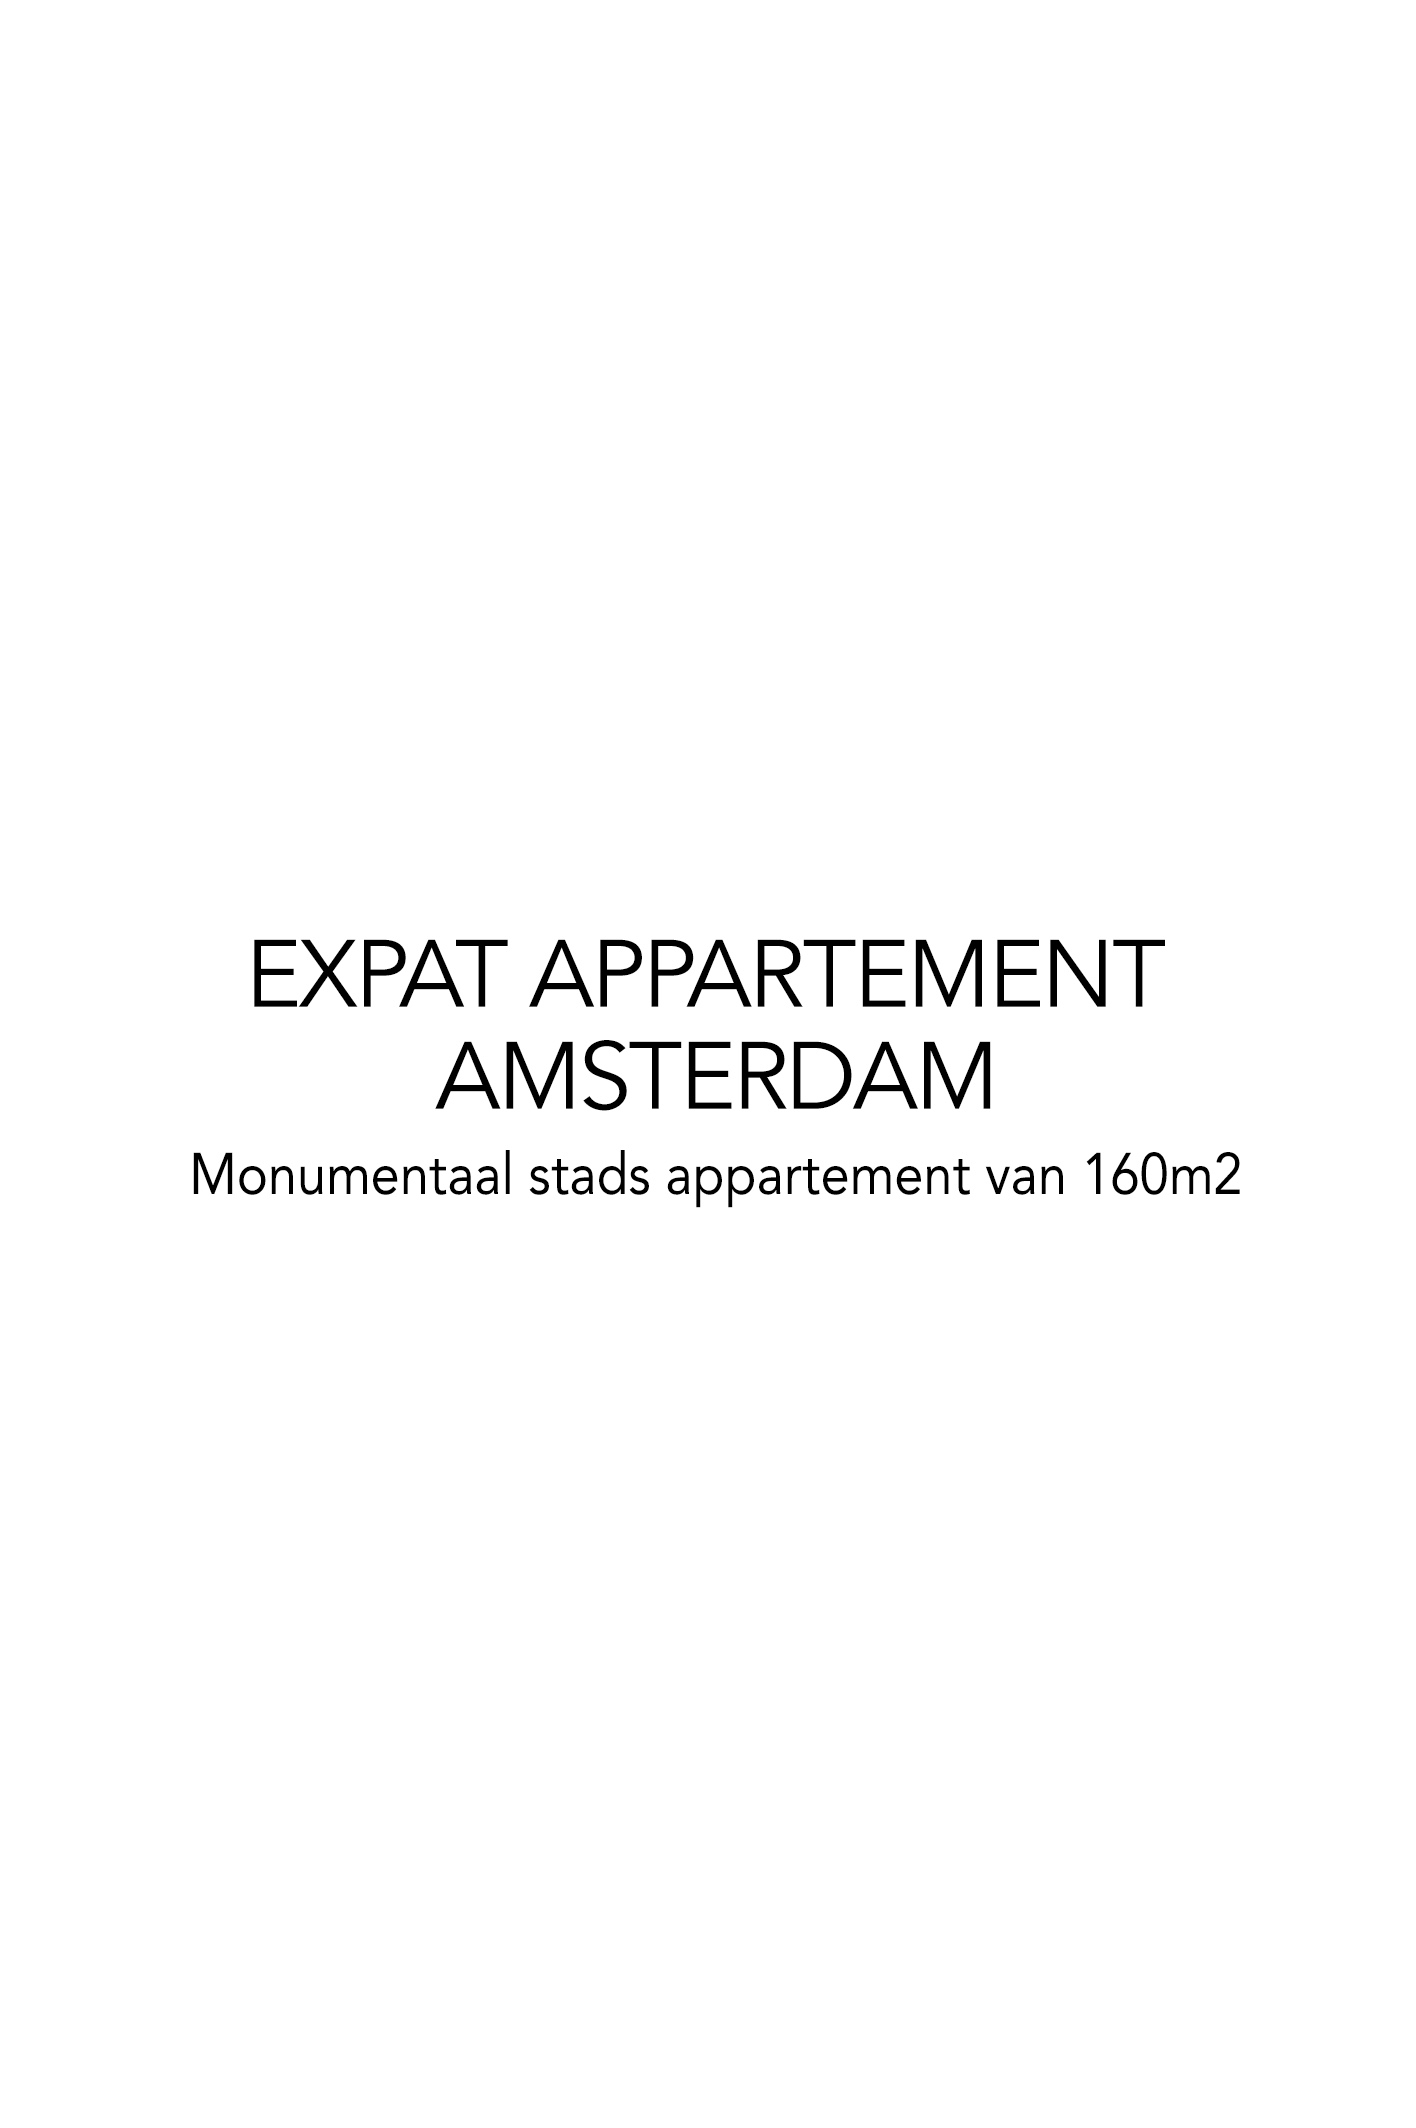 EXPAT APPARTEMENT AMSTERDAM